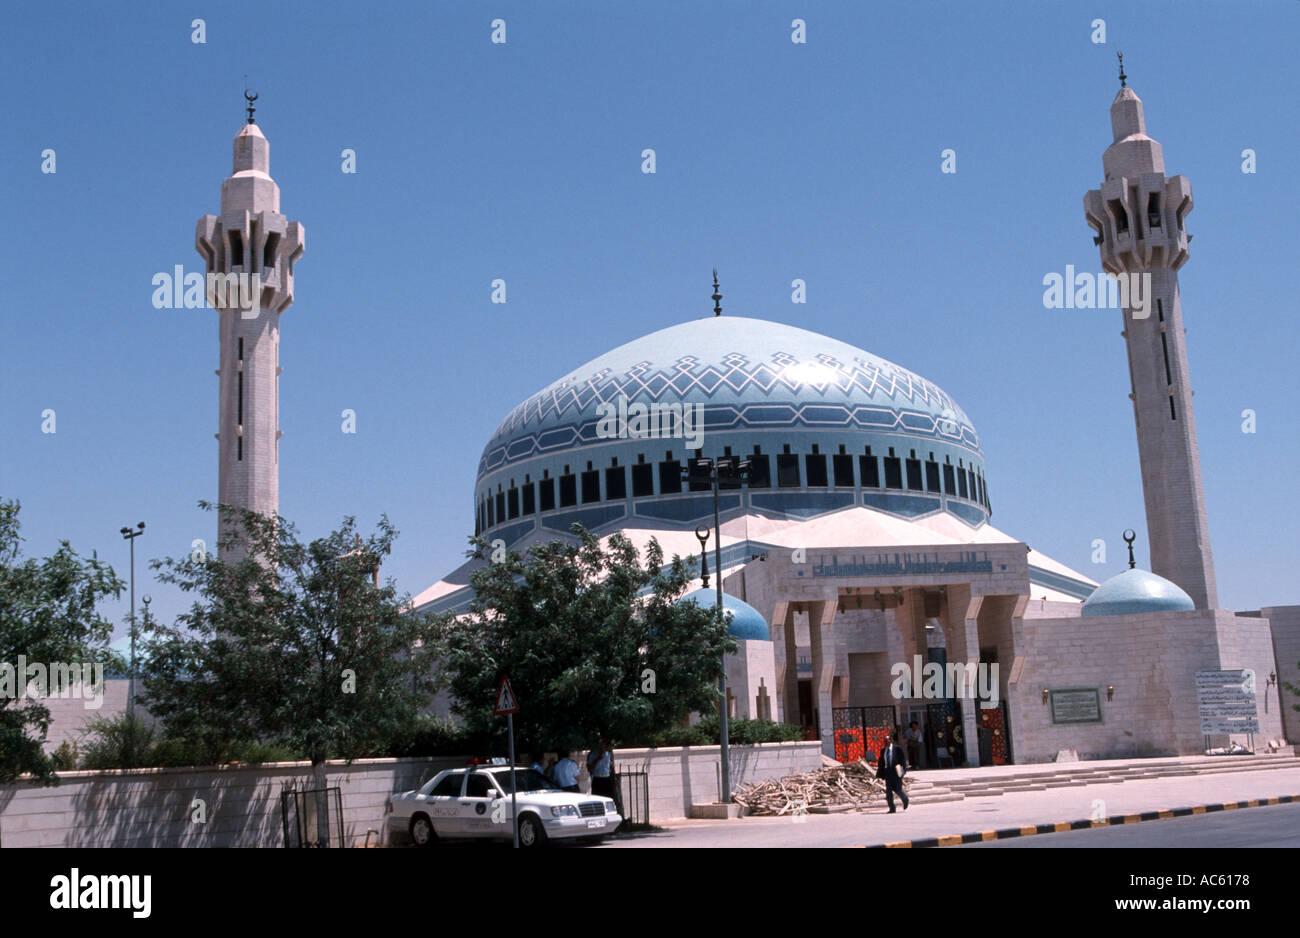 King Abdullah Mosque in Amman Jordan - Stock Image